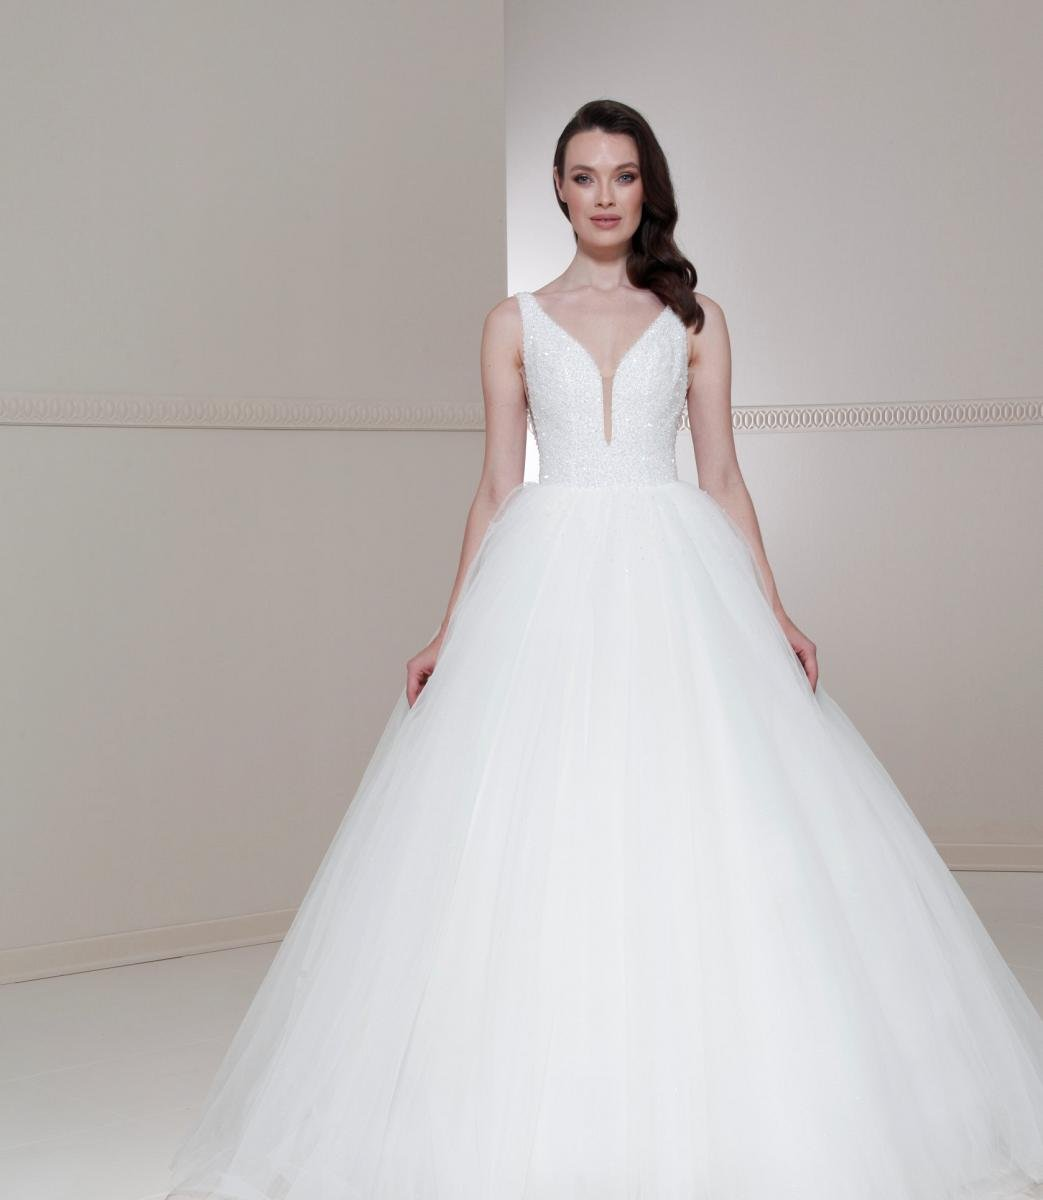 celli-spose-sposa-2022_CRYSTALLINE-BRIDALS-1209-1